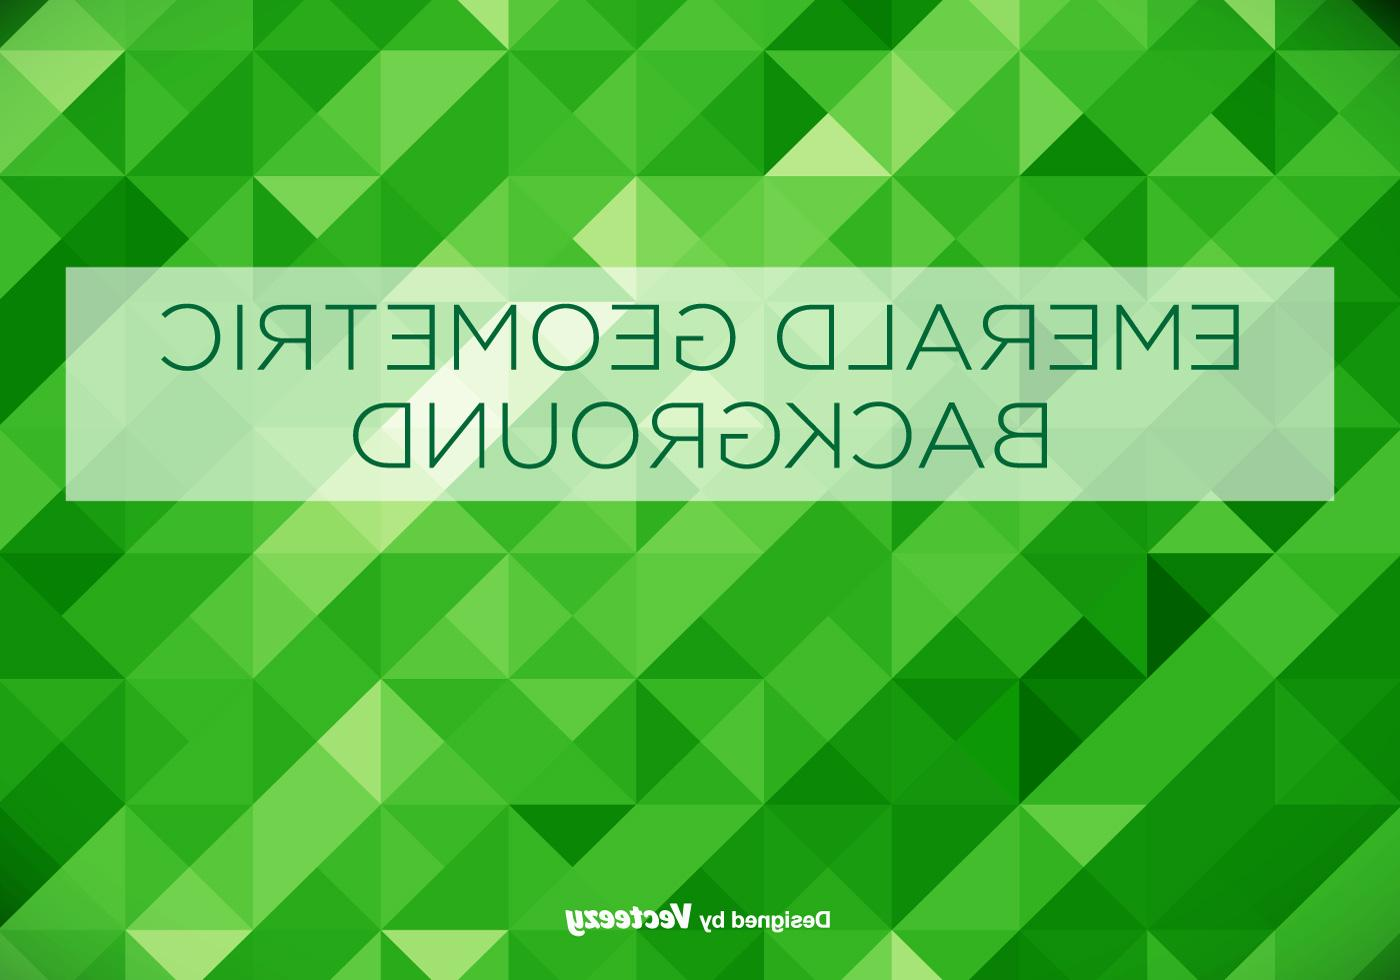 1400x980 Hd Emerald Green Geometrical Vector Background Photos